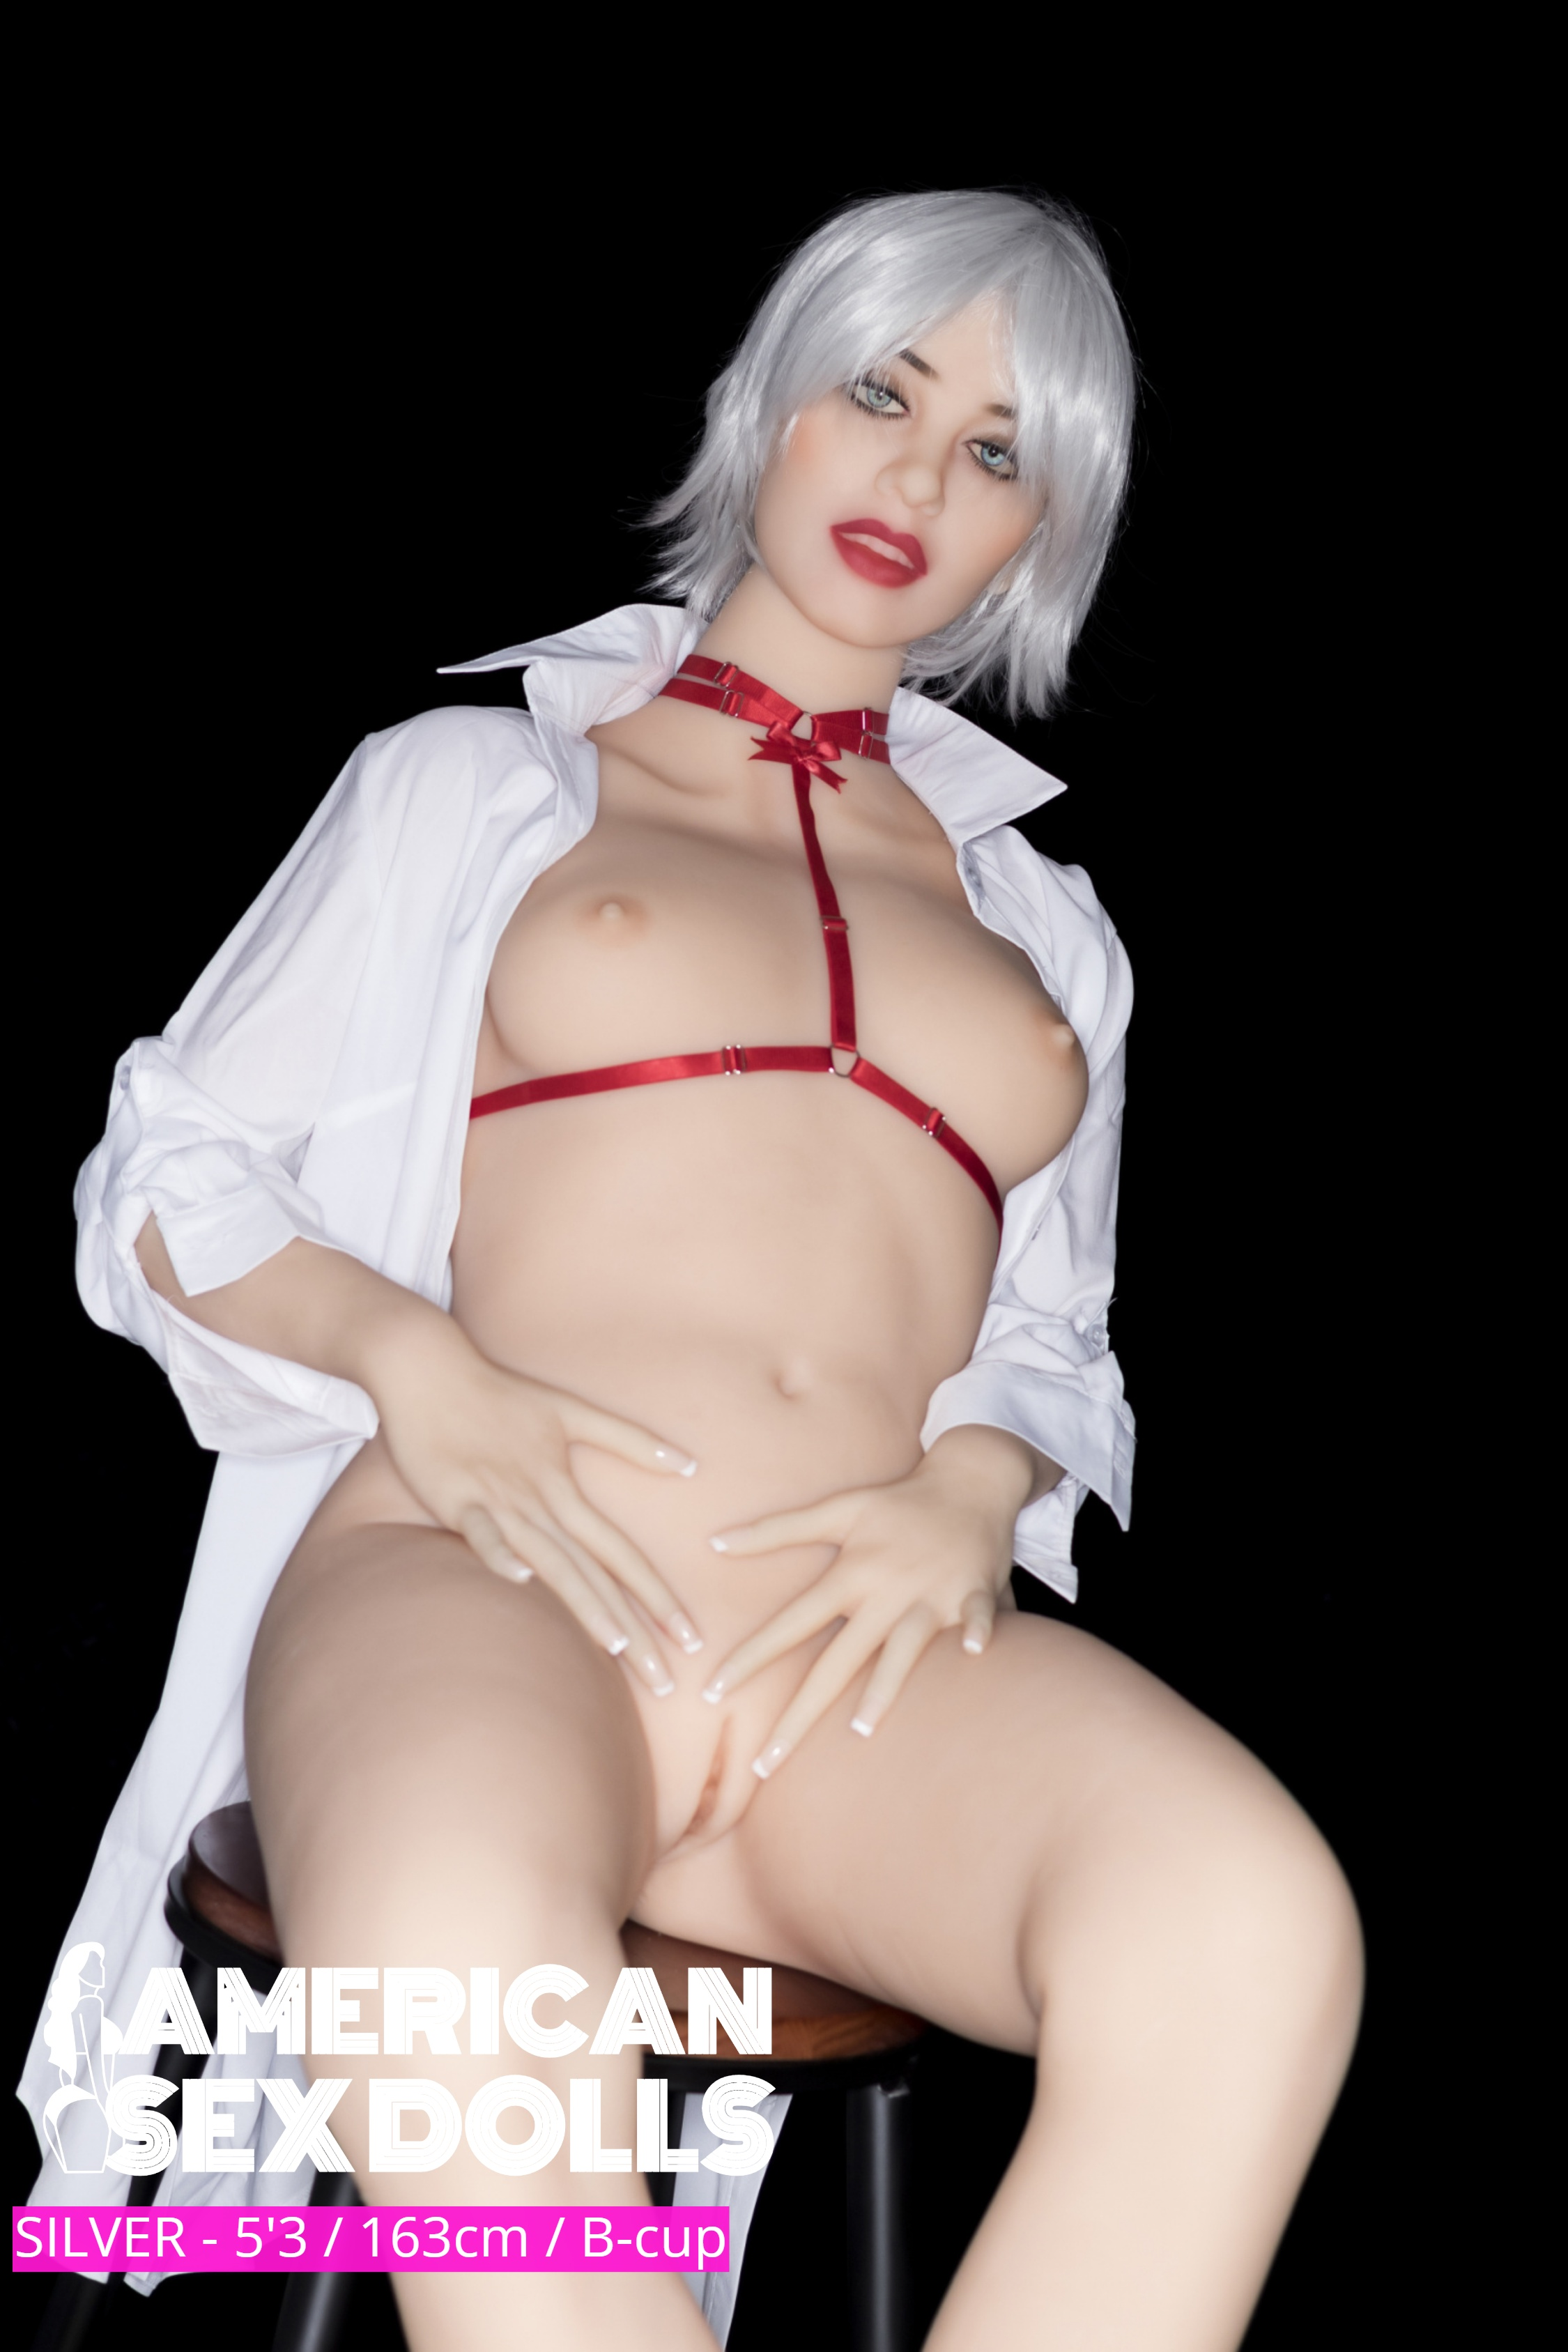 American Sex Doll WMDoll 162 Bcup 234 (20).jpg